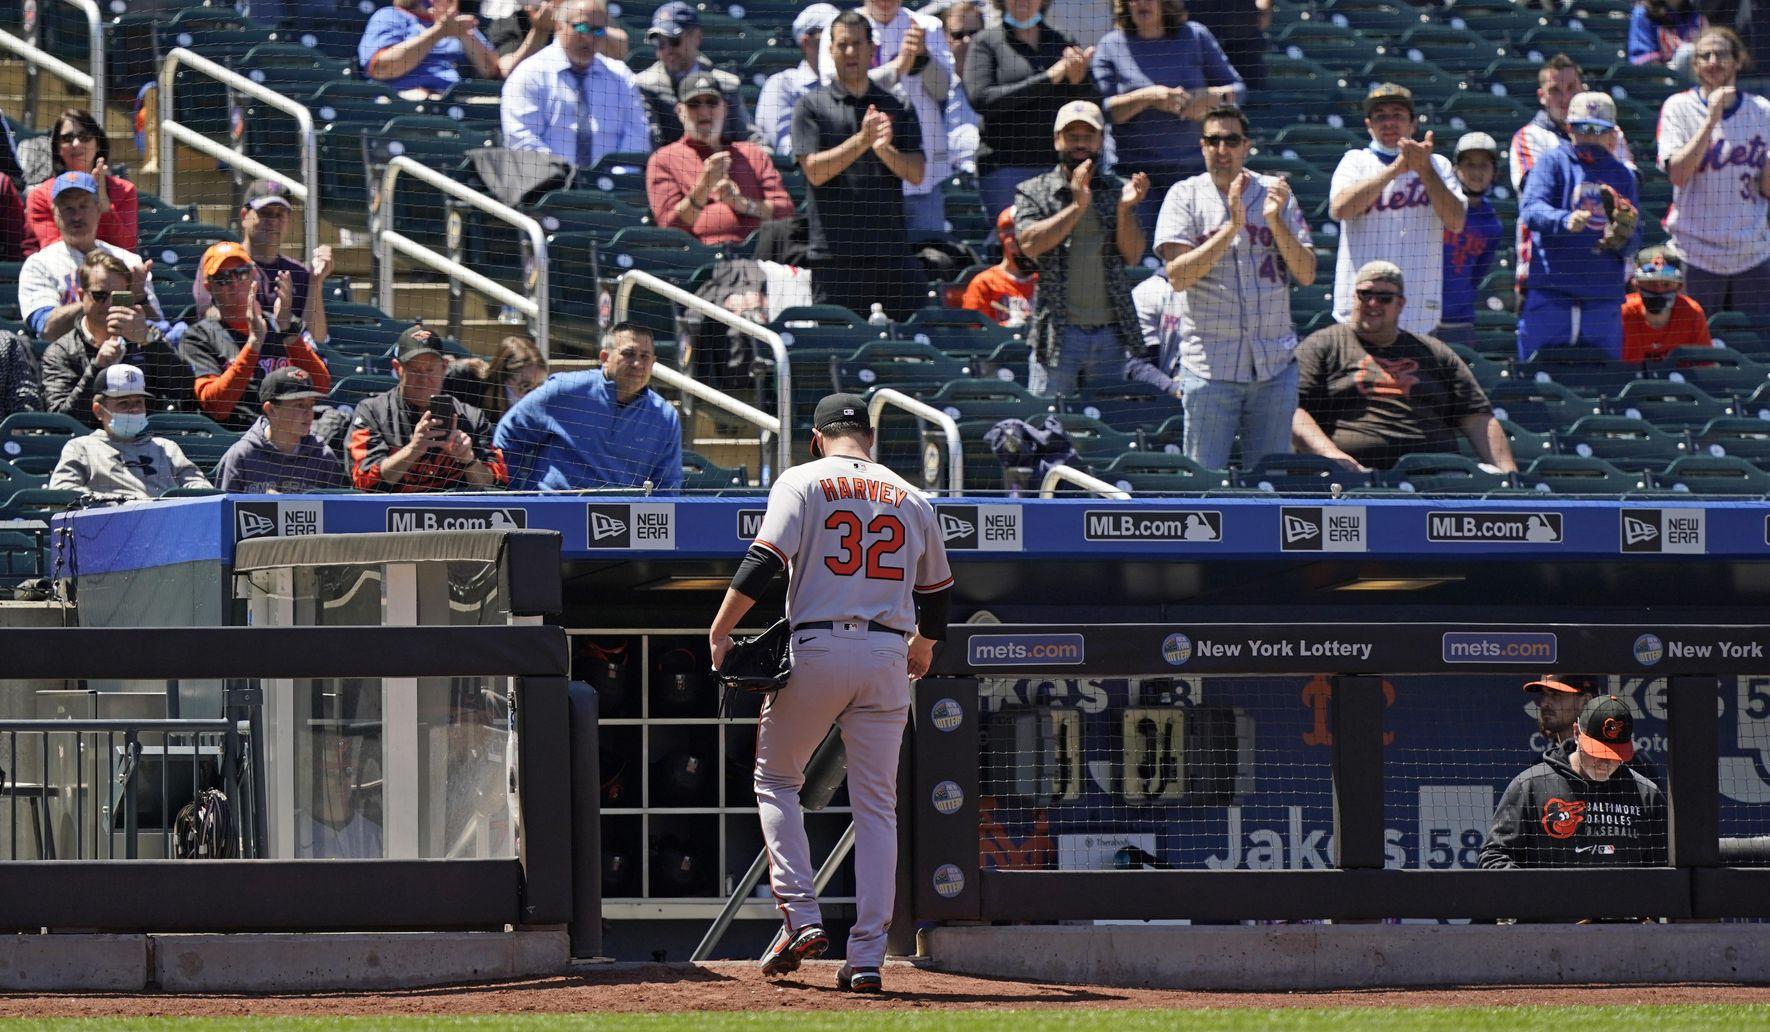 Orioles_mets_baseball_26658_c0-219-5731-3560_s1770x1032